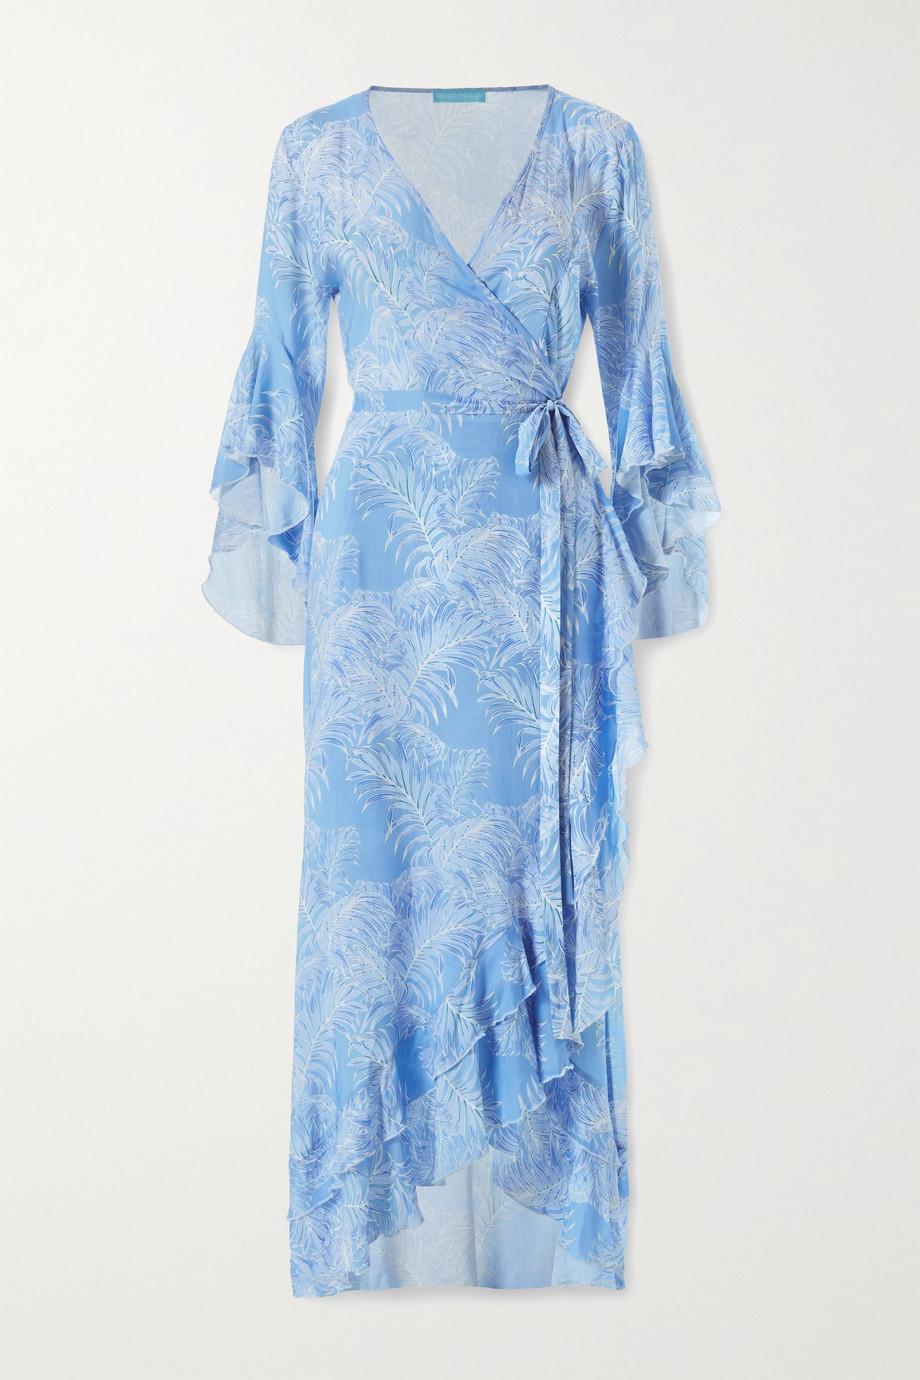 Melissa Odabash Cheryl ruffled printed voile wrap maxi dress